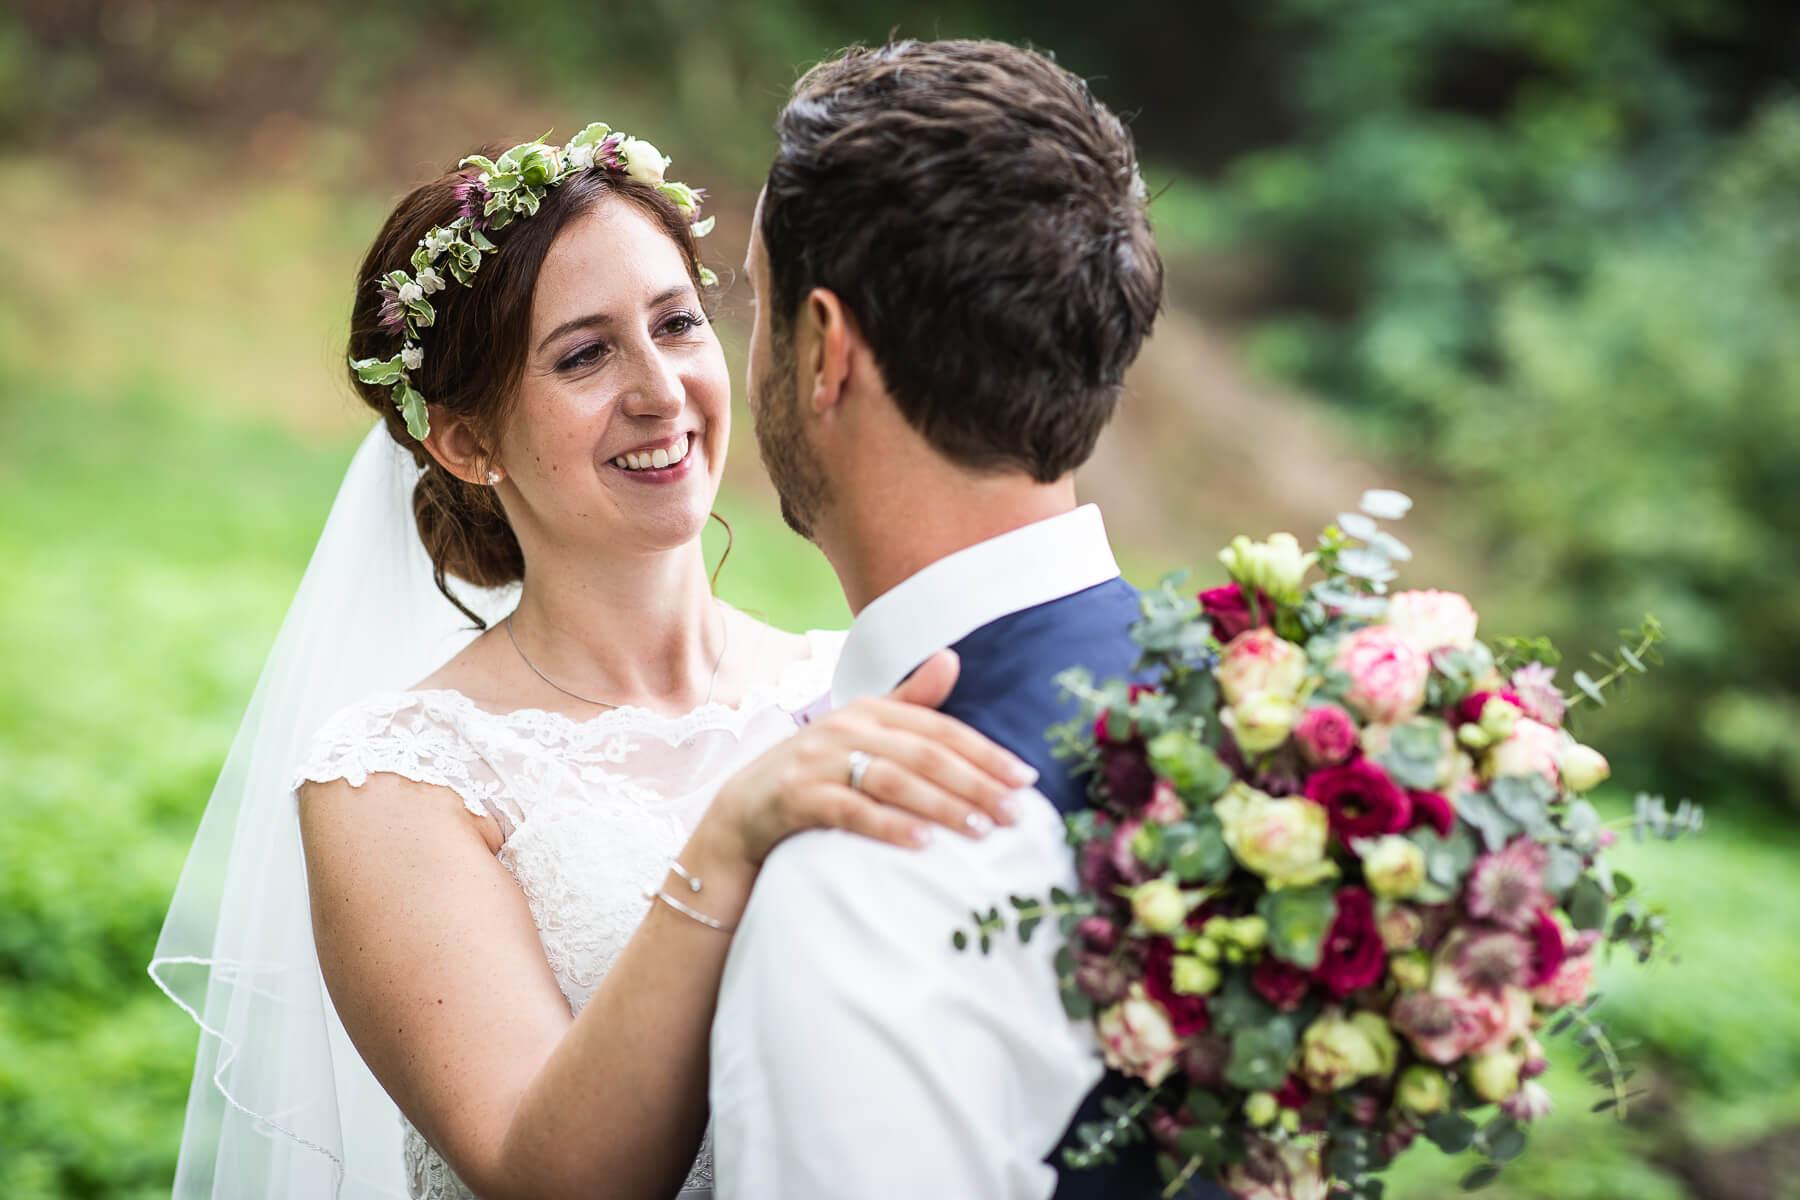 Hochzeitsreportage  Brautpaarshooting  Auermuehle  Ratingen 03